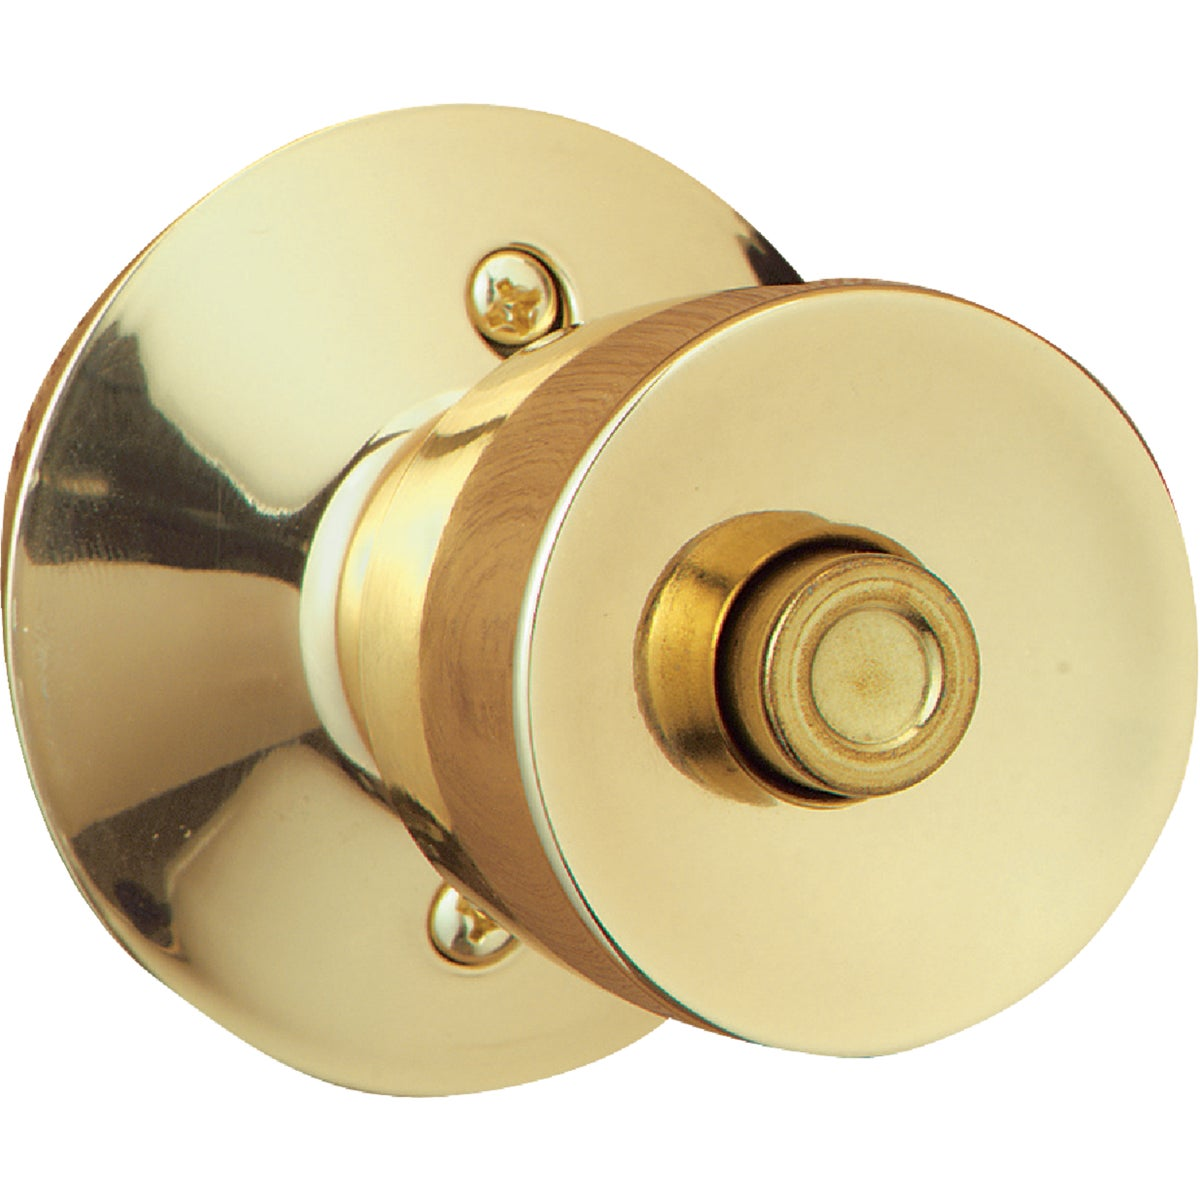 PB BELL PRIVACY KNOB - F40VBEL605 by Schlage Lock Co